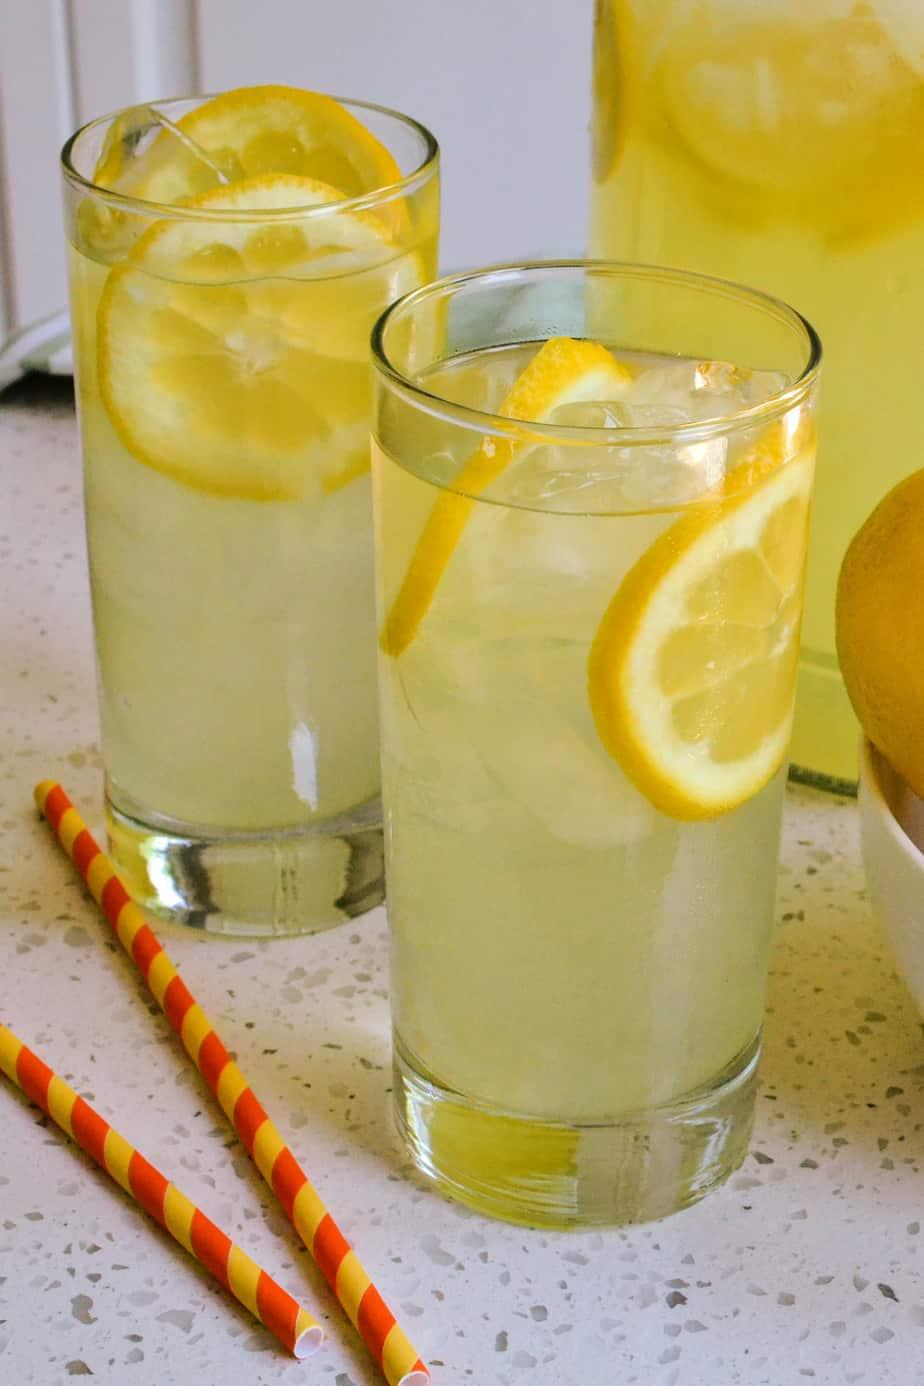 Glasses filled with lemon slices, ice, and fresh lemonade.